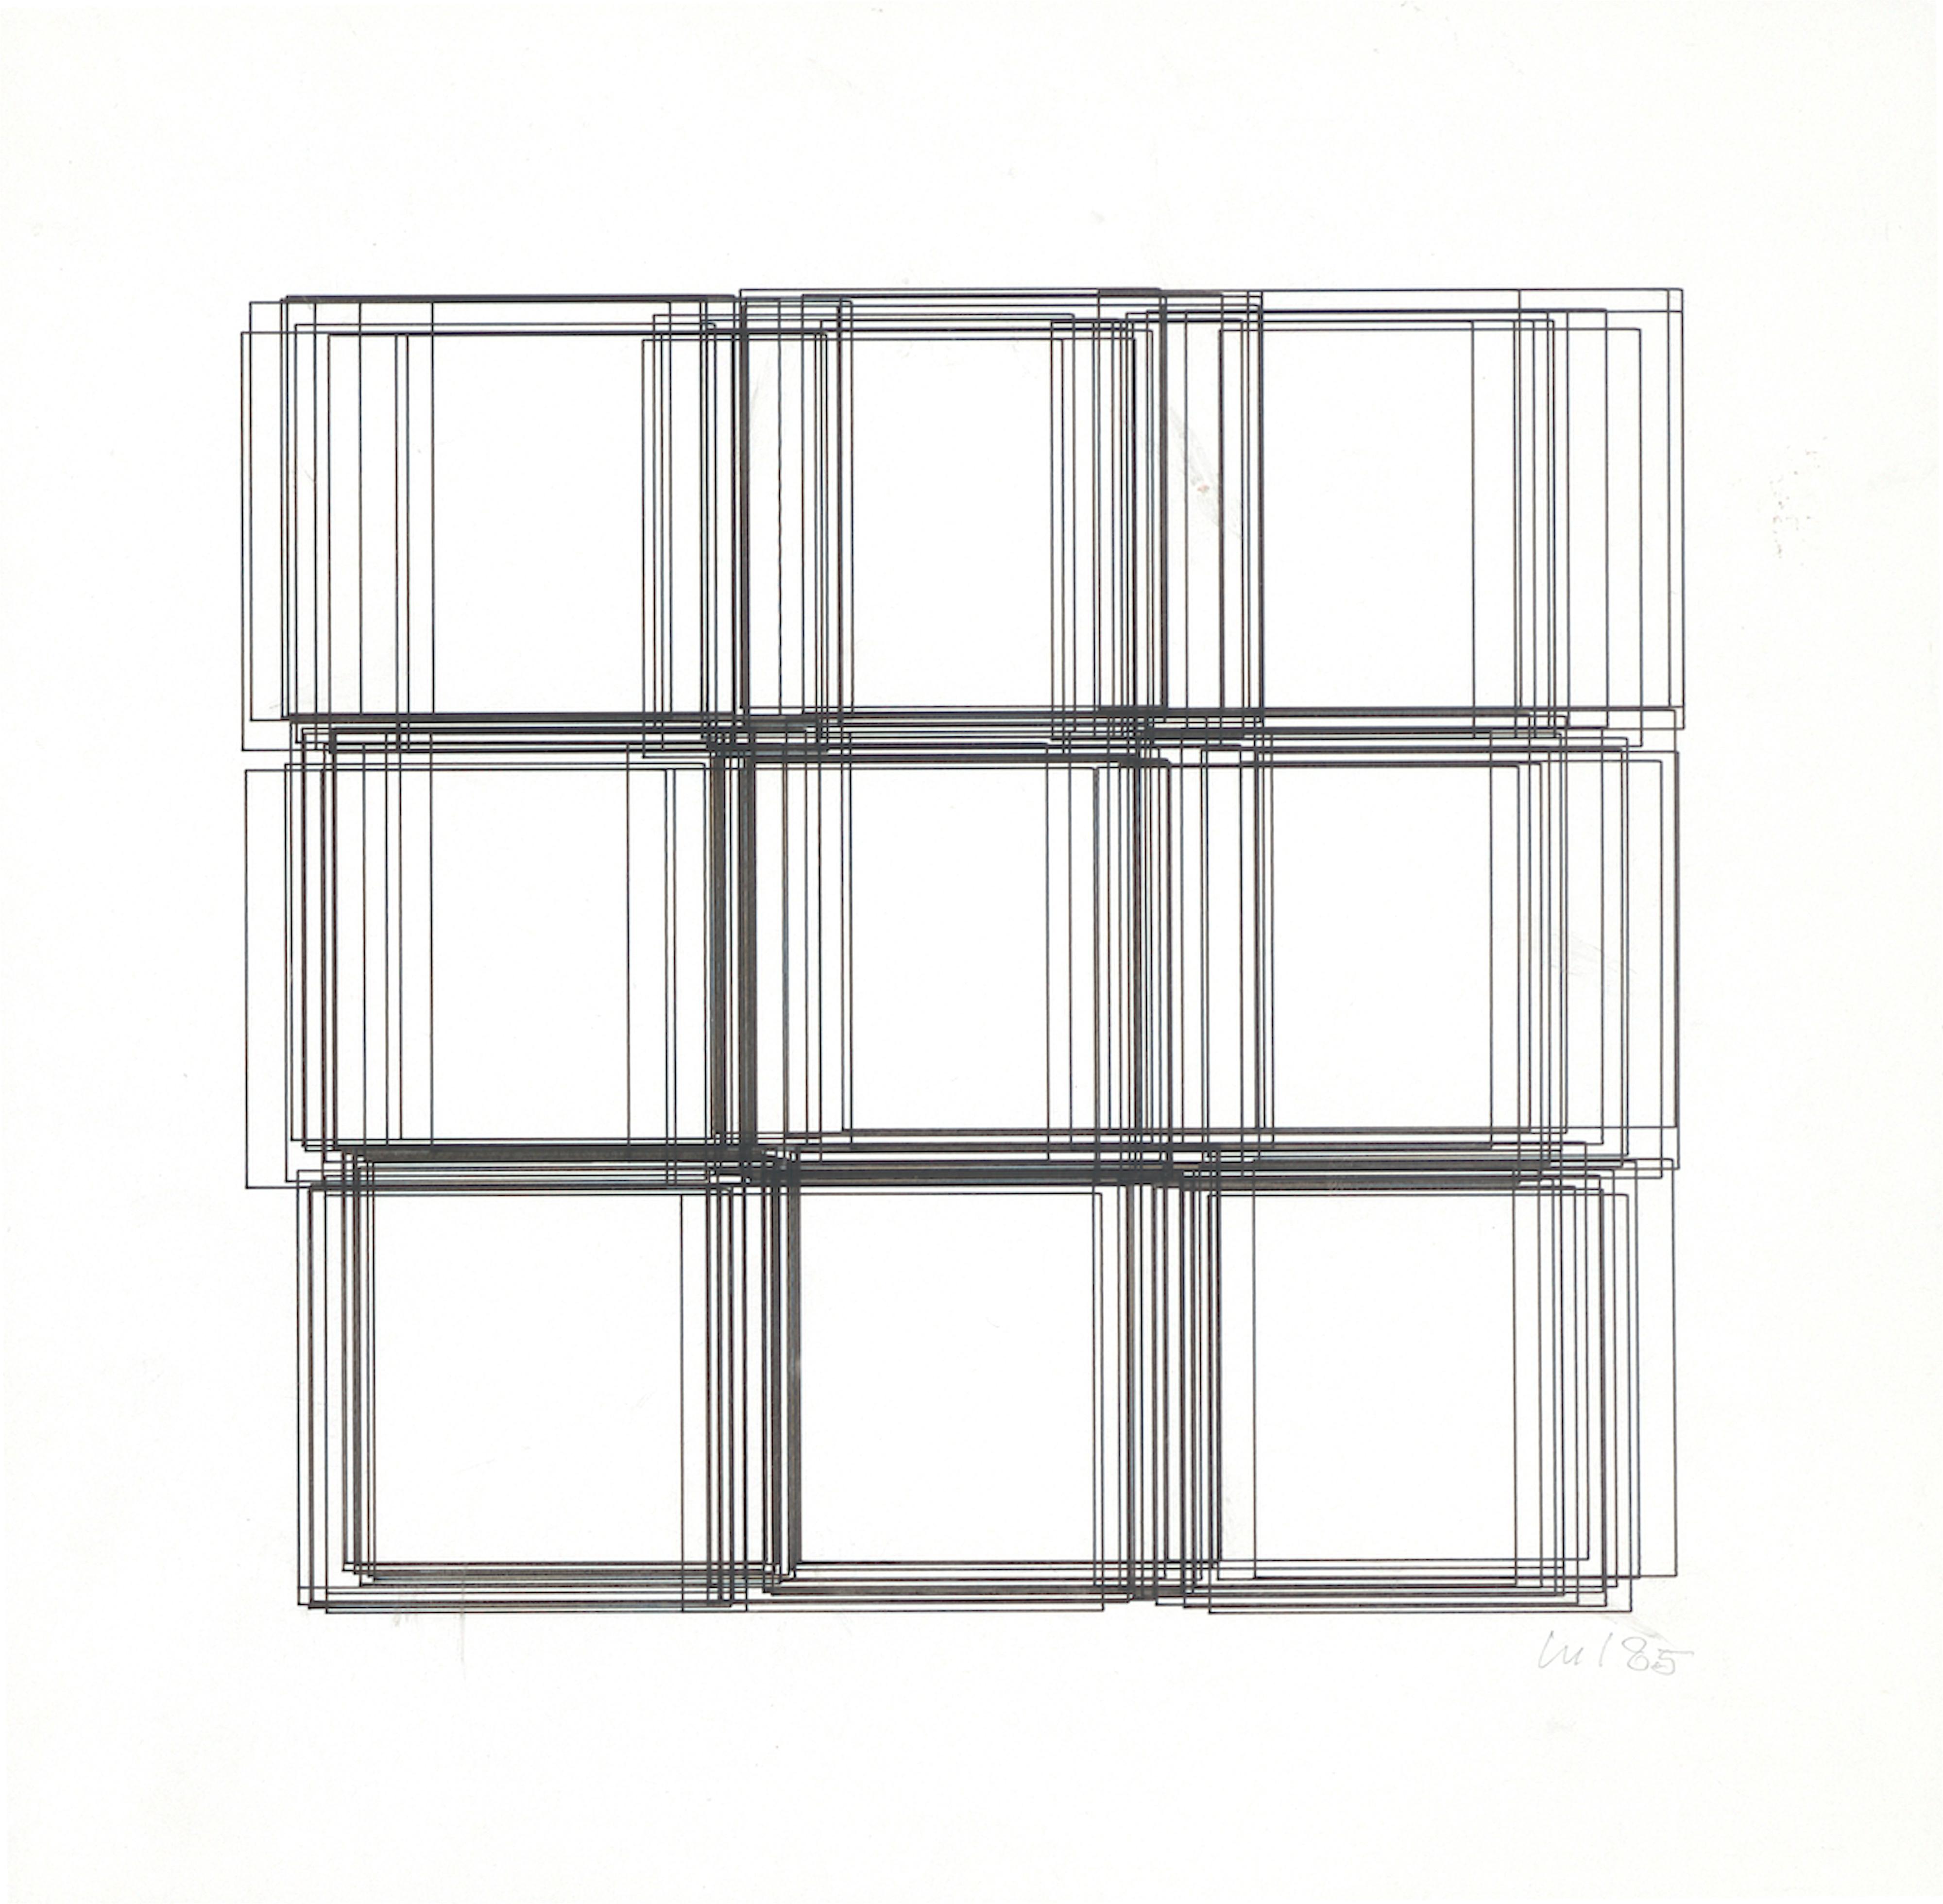 Vera Molnar, Repentier, 22 x 23 cm, plotter drawing, ink on paper, 1985